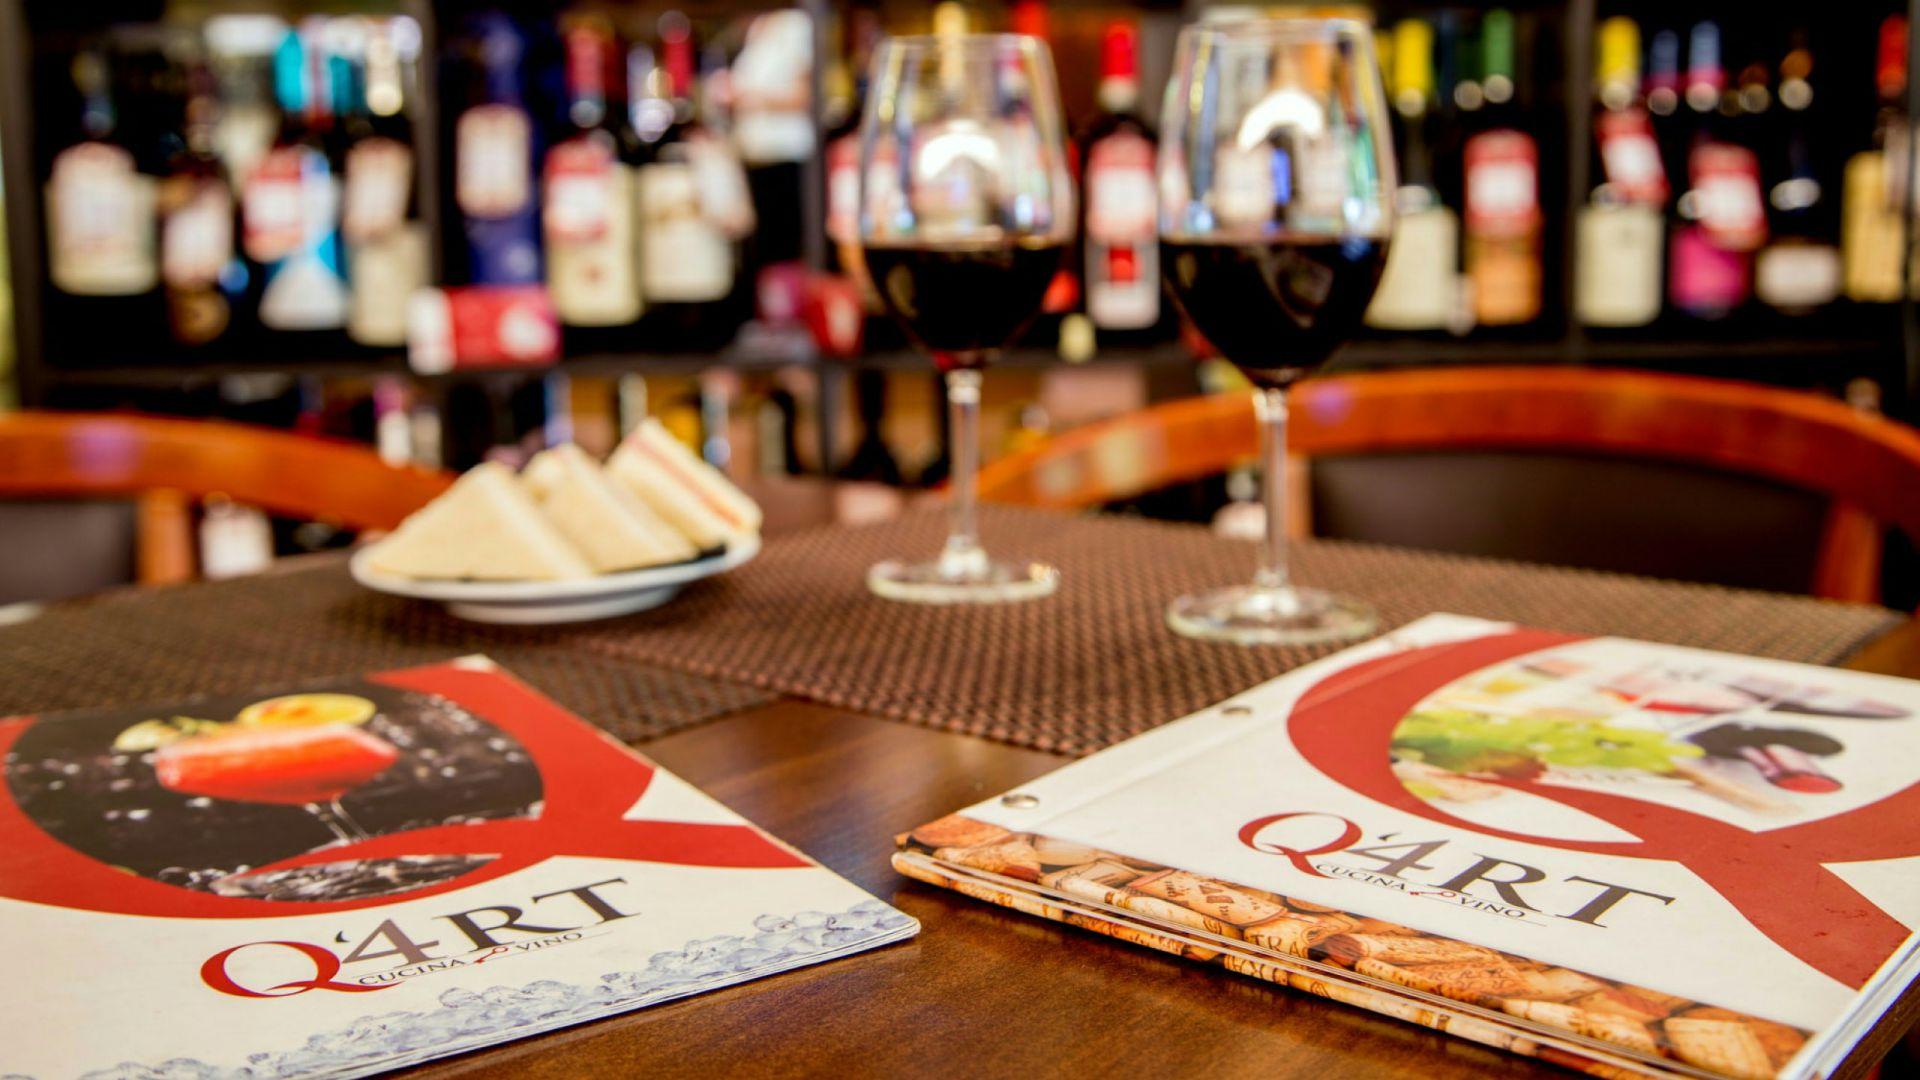 Foto-Hotel-Oxford-Roma-bar-de-vinhos-6